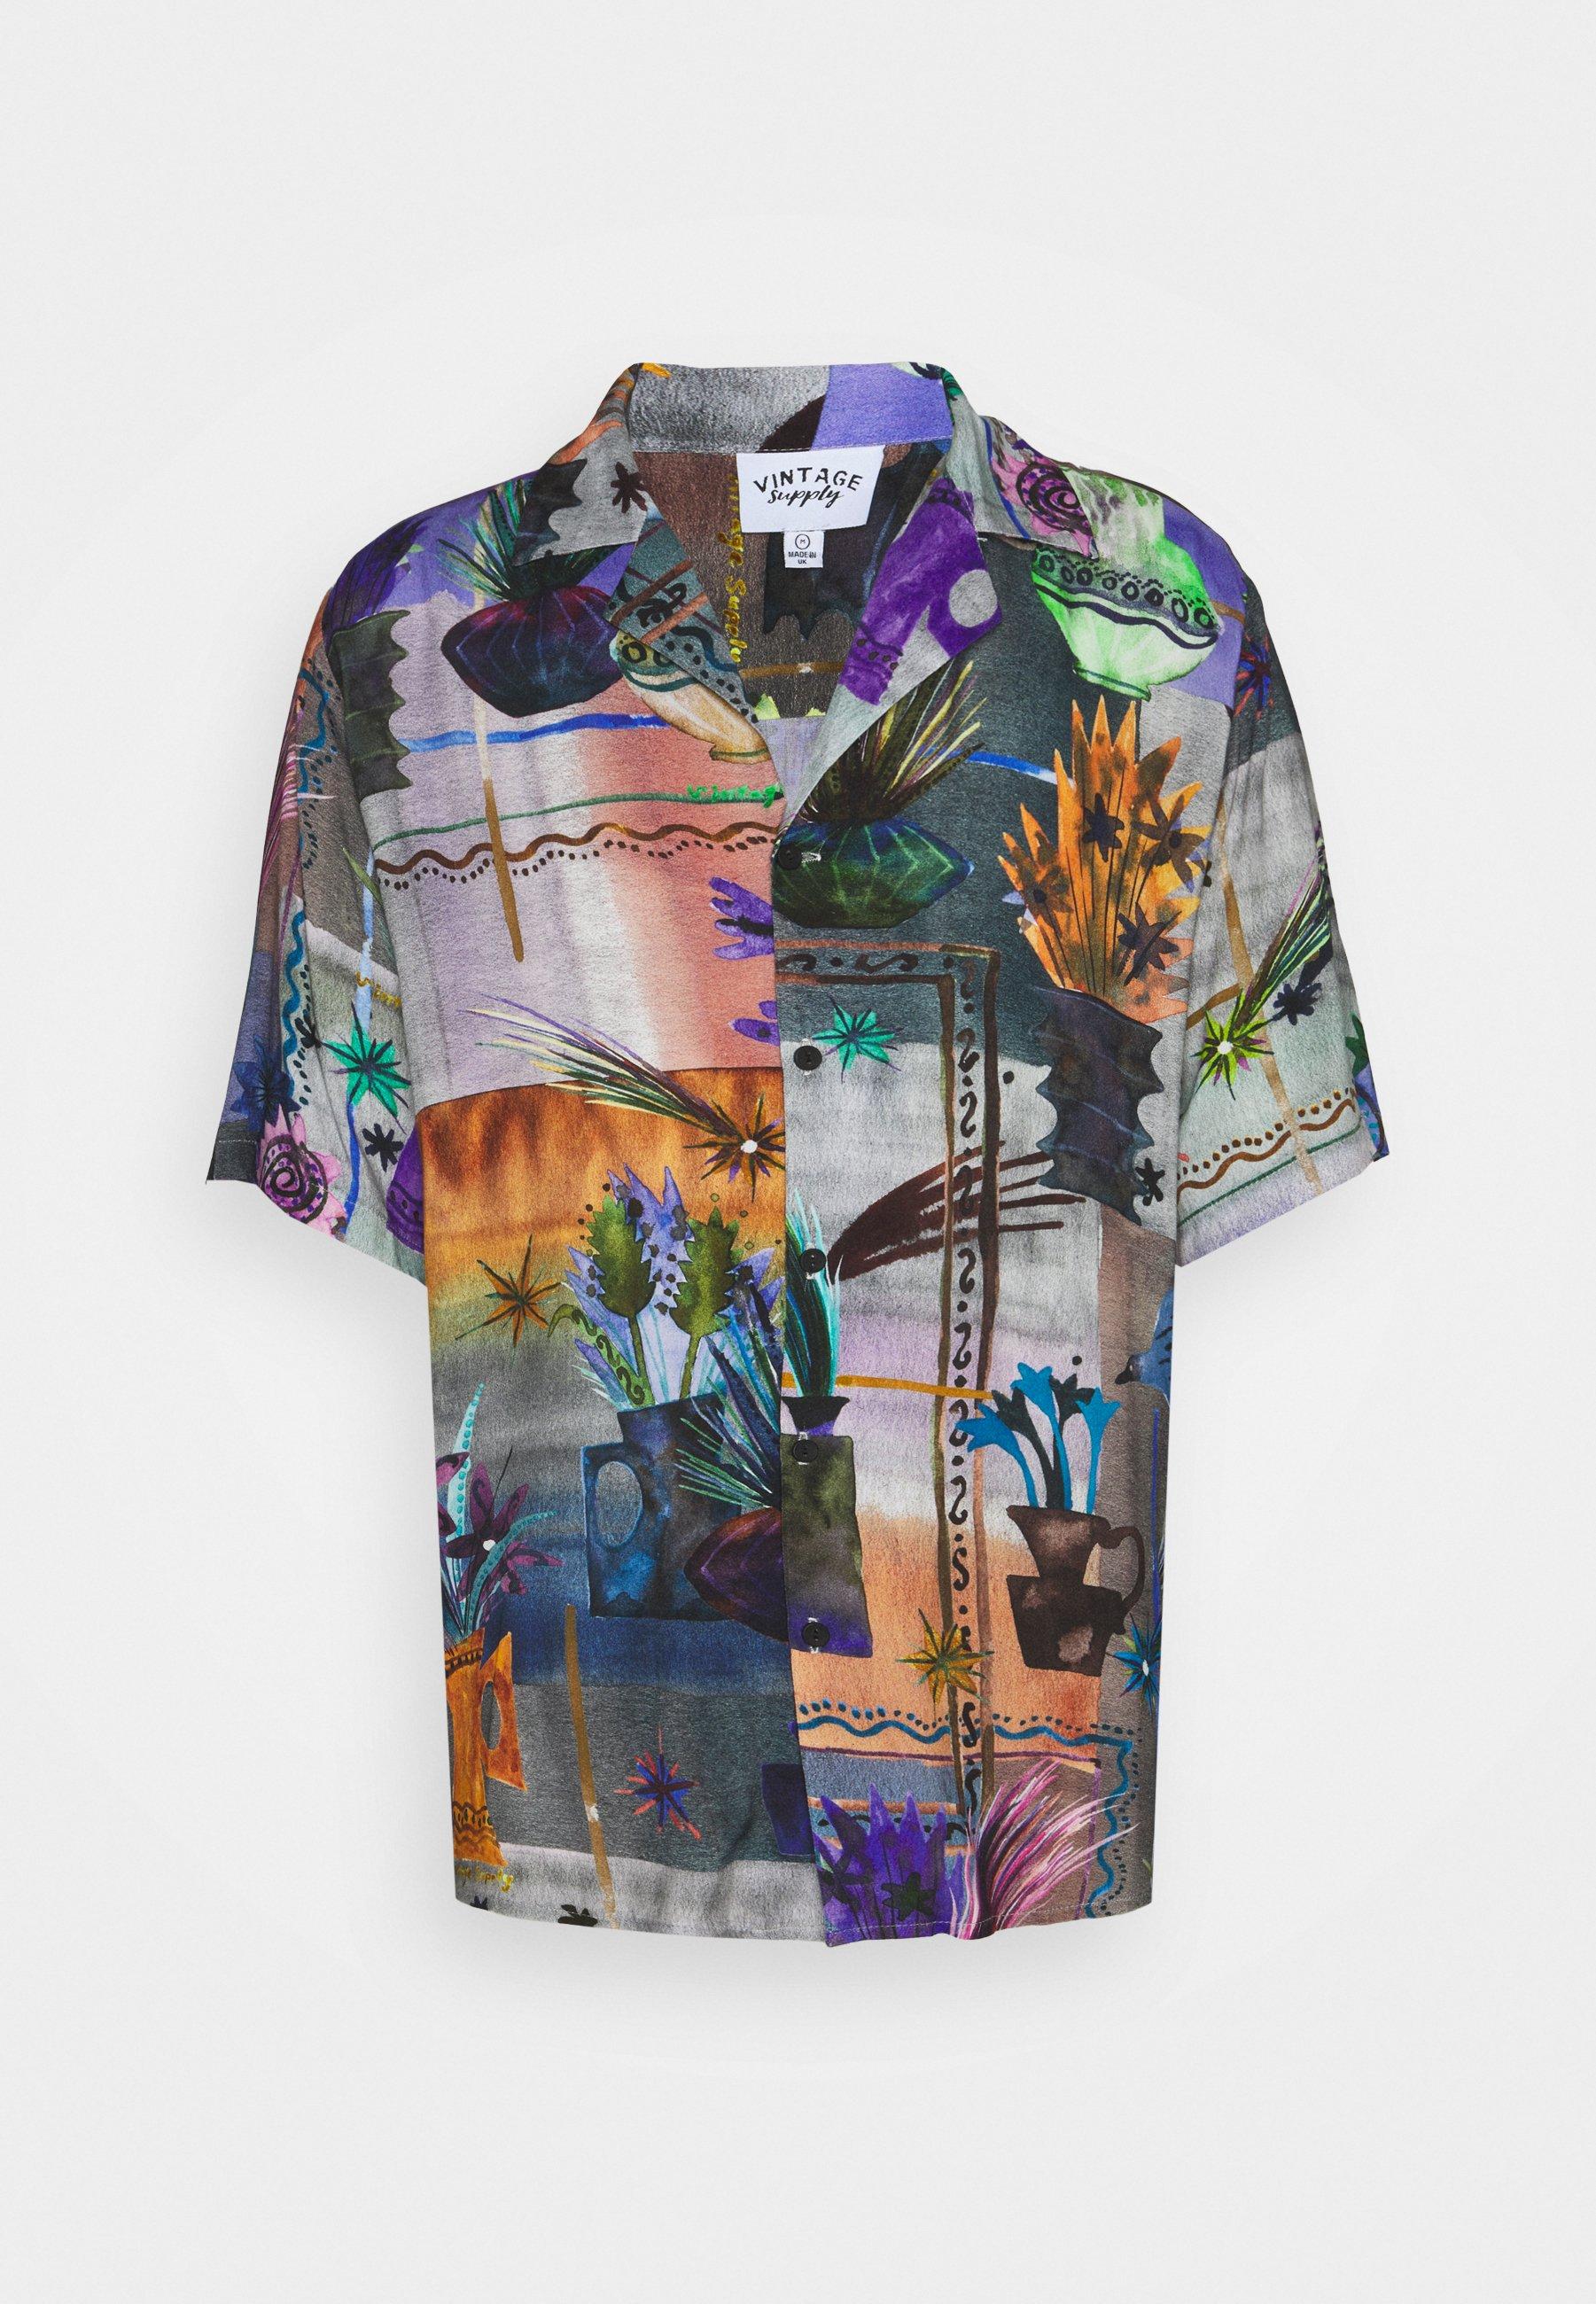 Men REVERE COLLAR SHIRT IN ARTY COLLAGE UNISEX - Shirt